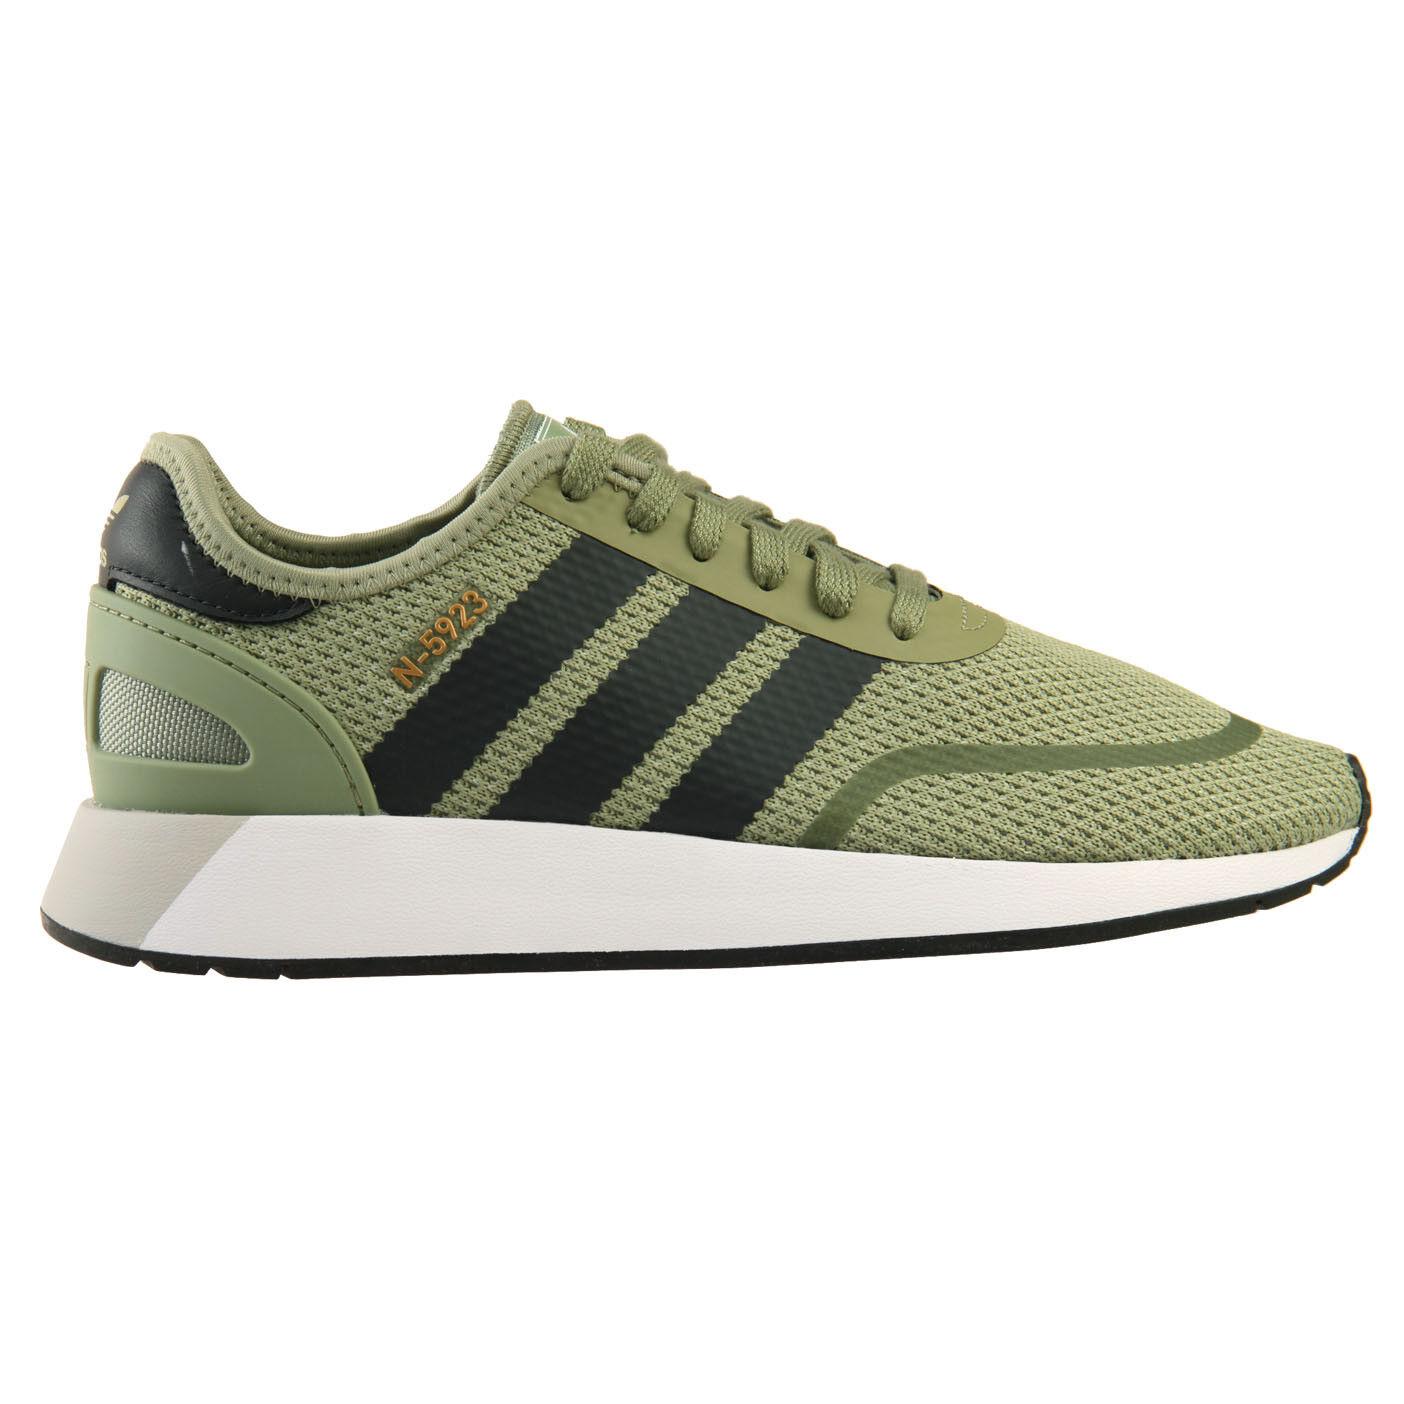 288a5f165d Adidas N-5923 para hombre DB0959 Carpa verde De Carbono blancoo Running Zapatos  Talla 10